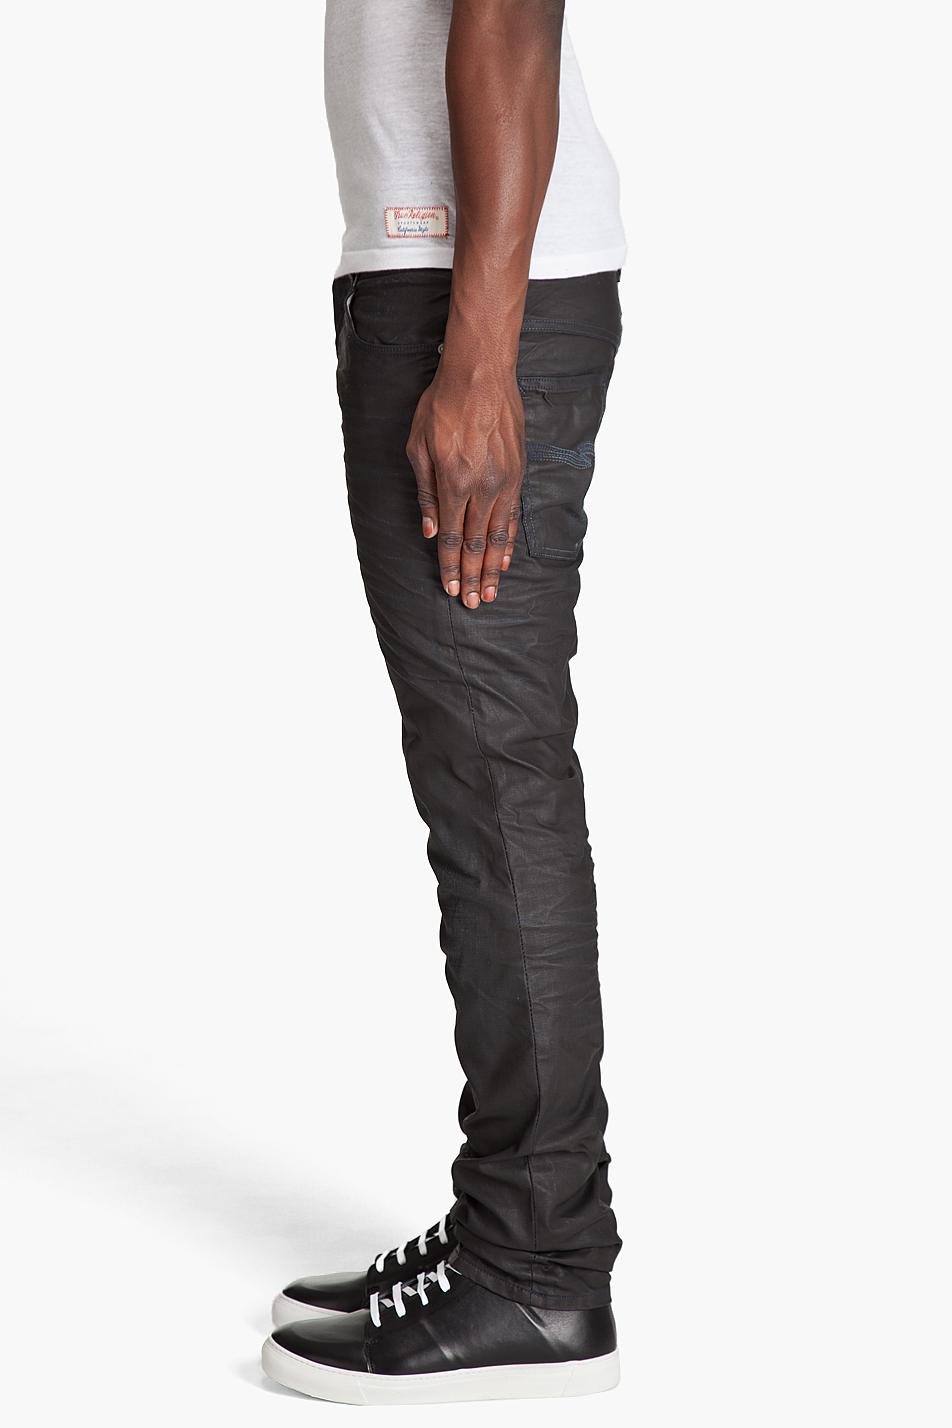 lyst nudie jeans thin finn black coated jeans in black. Black Bedroom Furniture Sets. Home Design Ideas